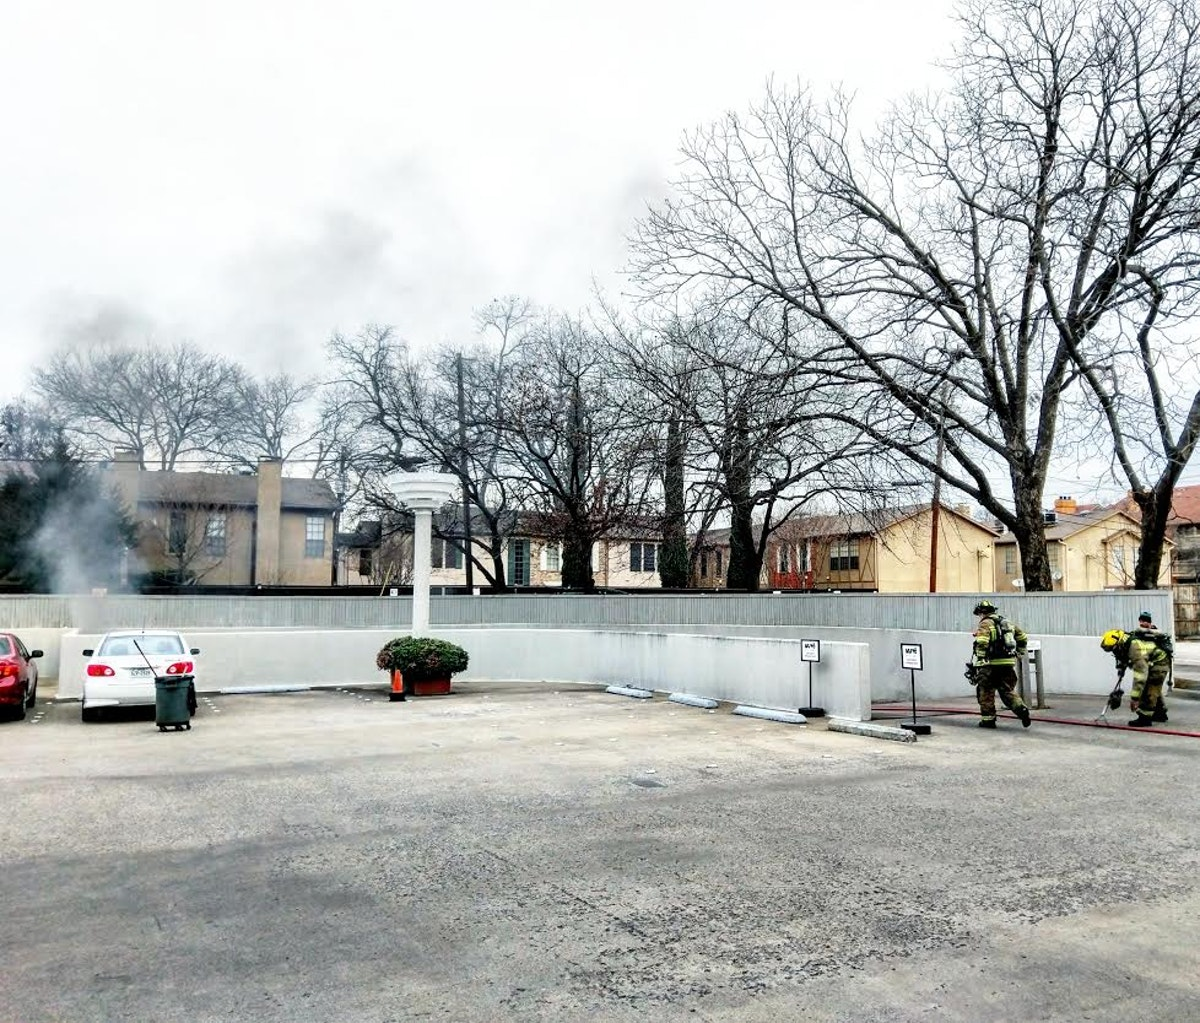 Spontaneous Combustion Sparks Fire In Oak Lawn Parking